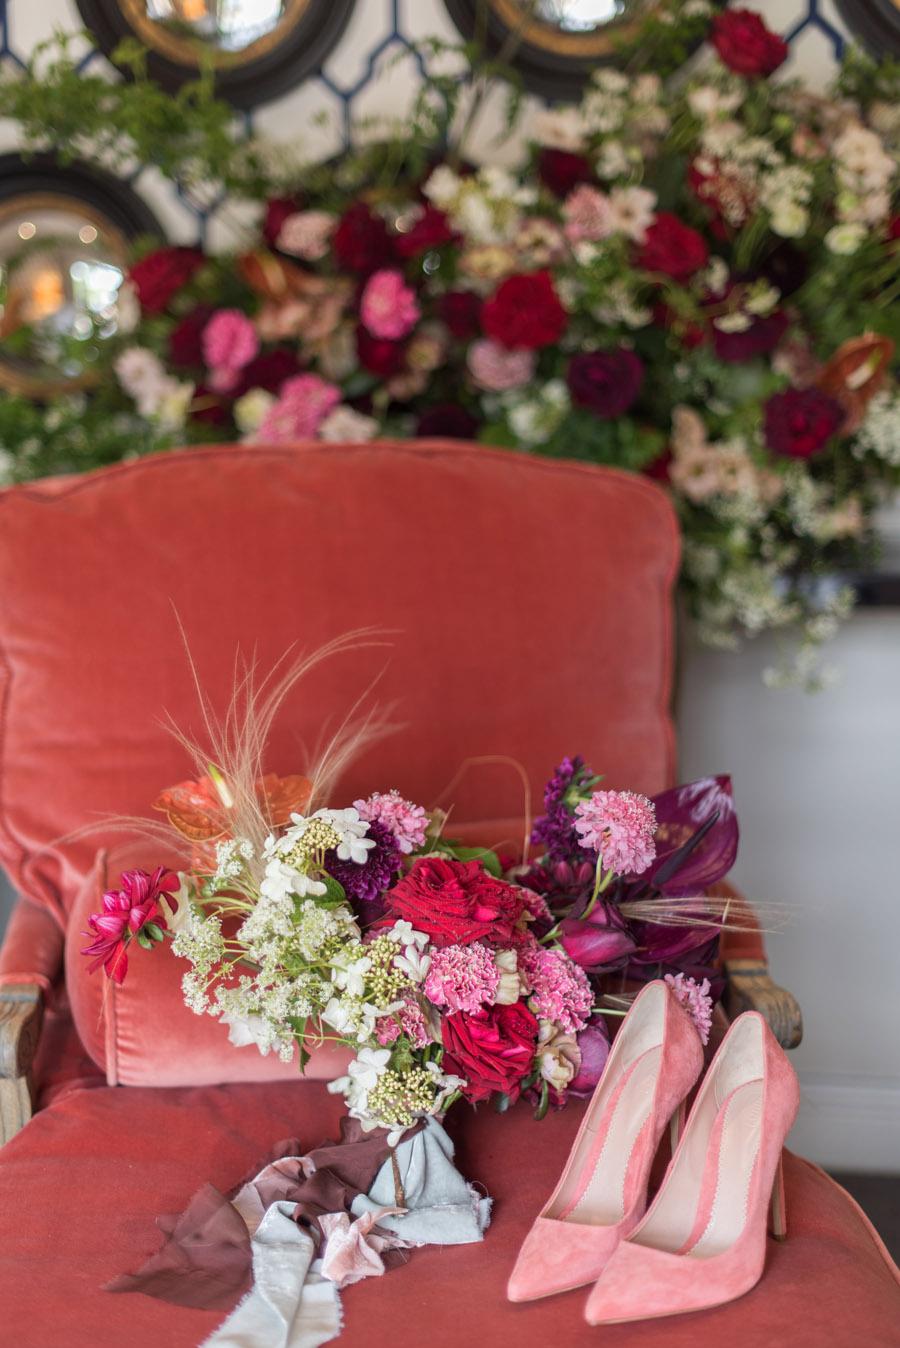 floral wedding ideas at Millbridge Court on English Wedding - photo credit Julie Michaelsen Photography (26)